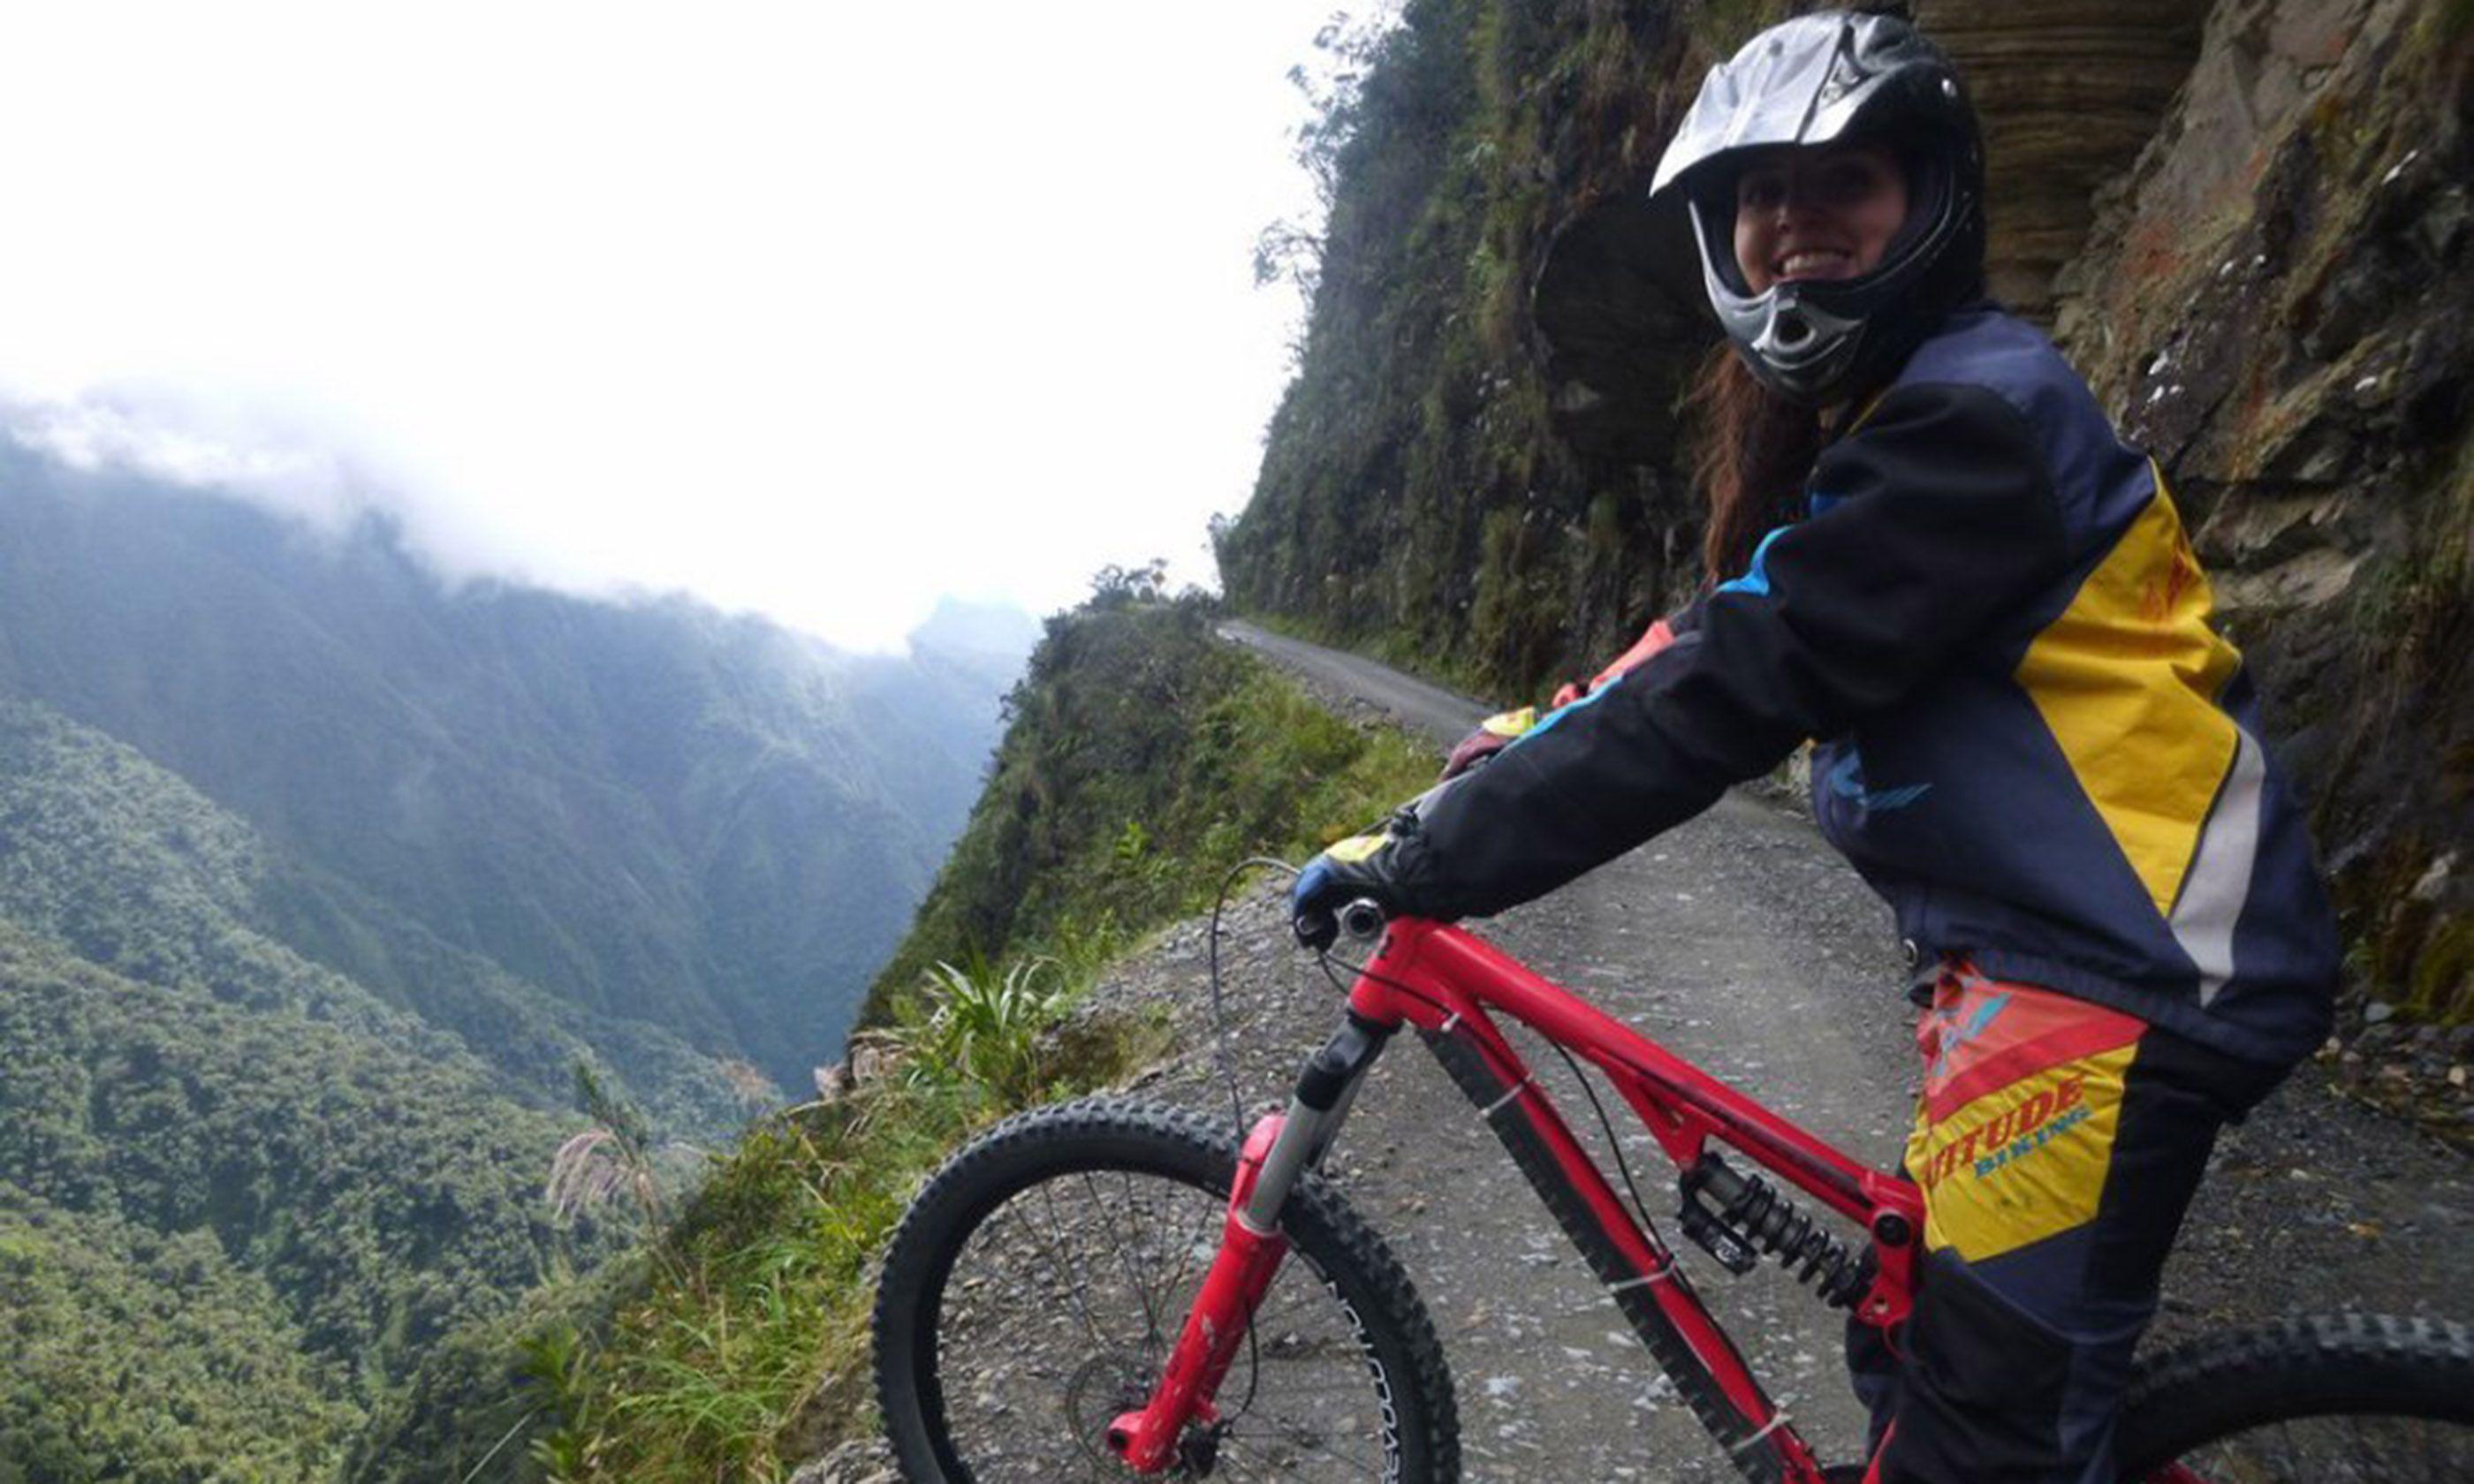 Biking Bolivia's notorious Death Road (Kelly Ross)